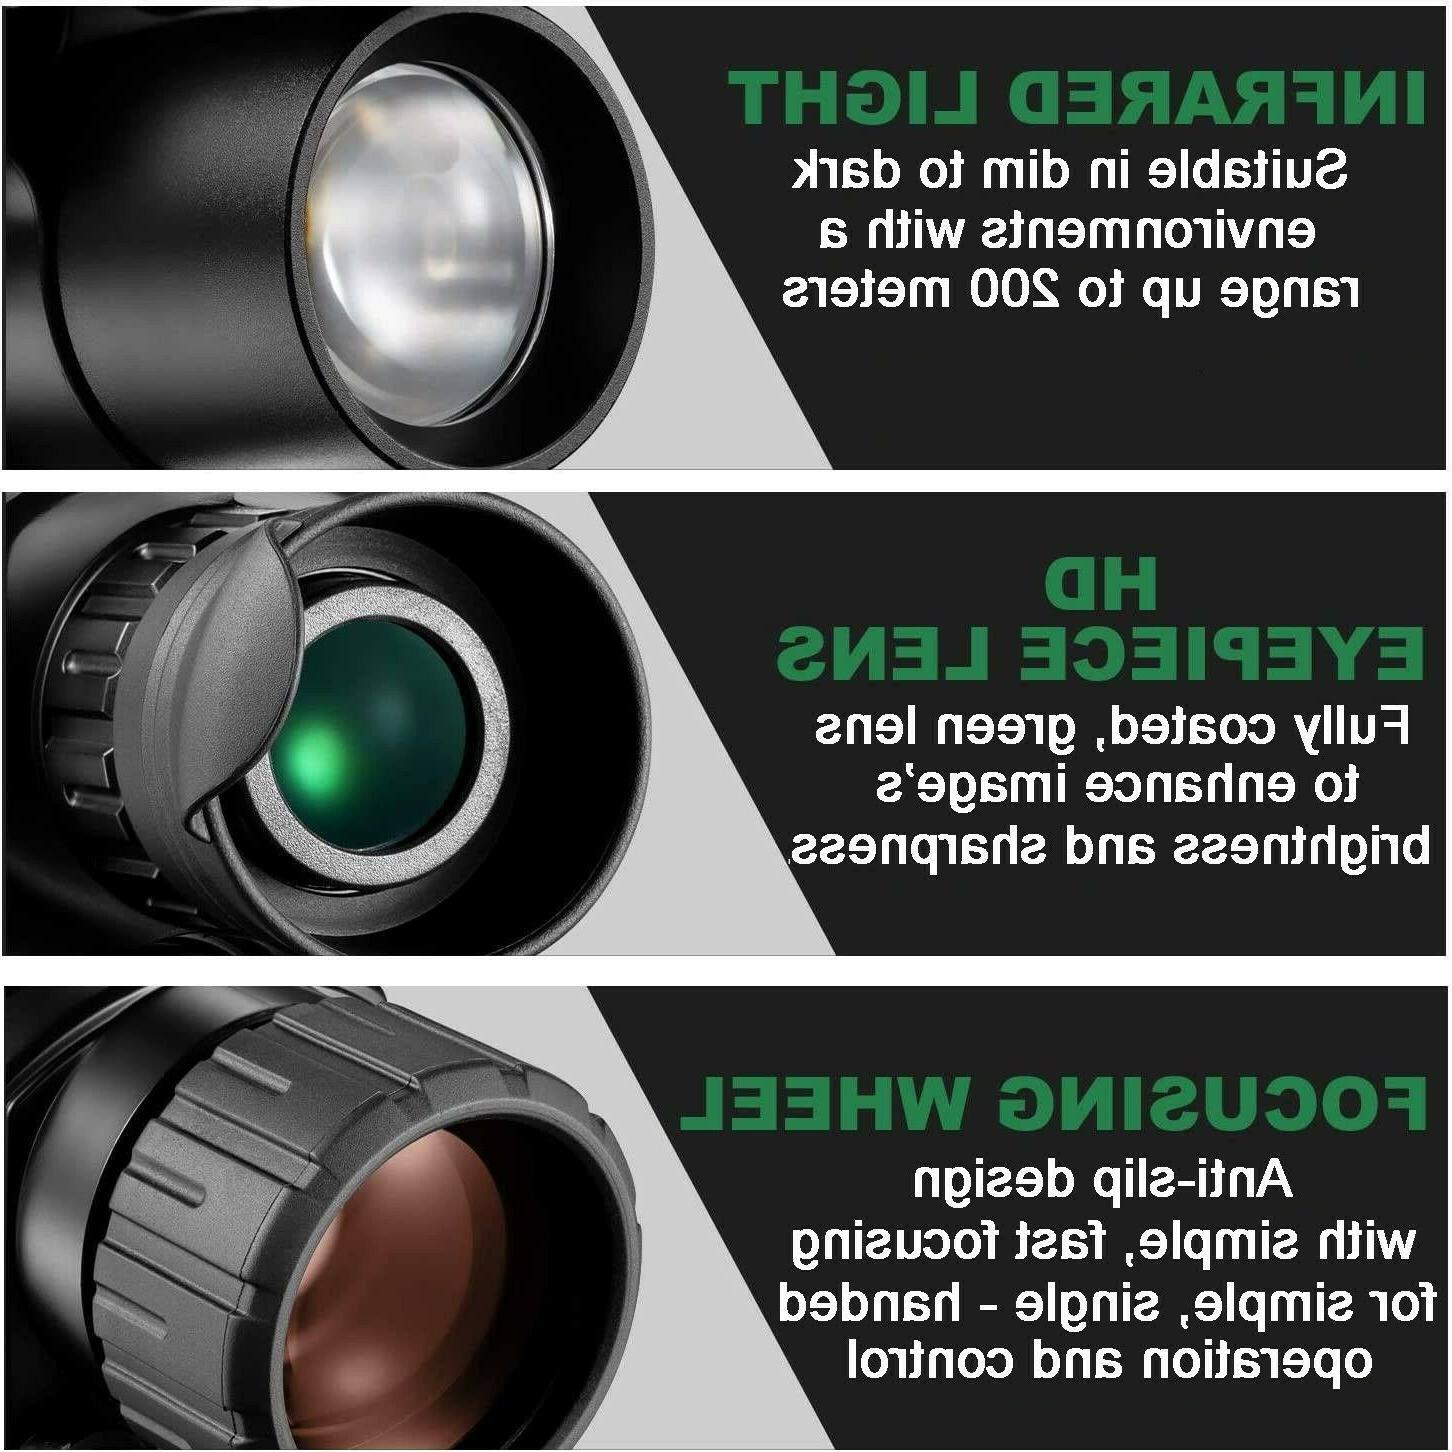 Night INFRARED video 5x40 Monocular Surveillance Hunting